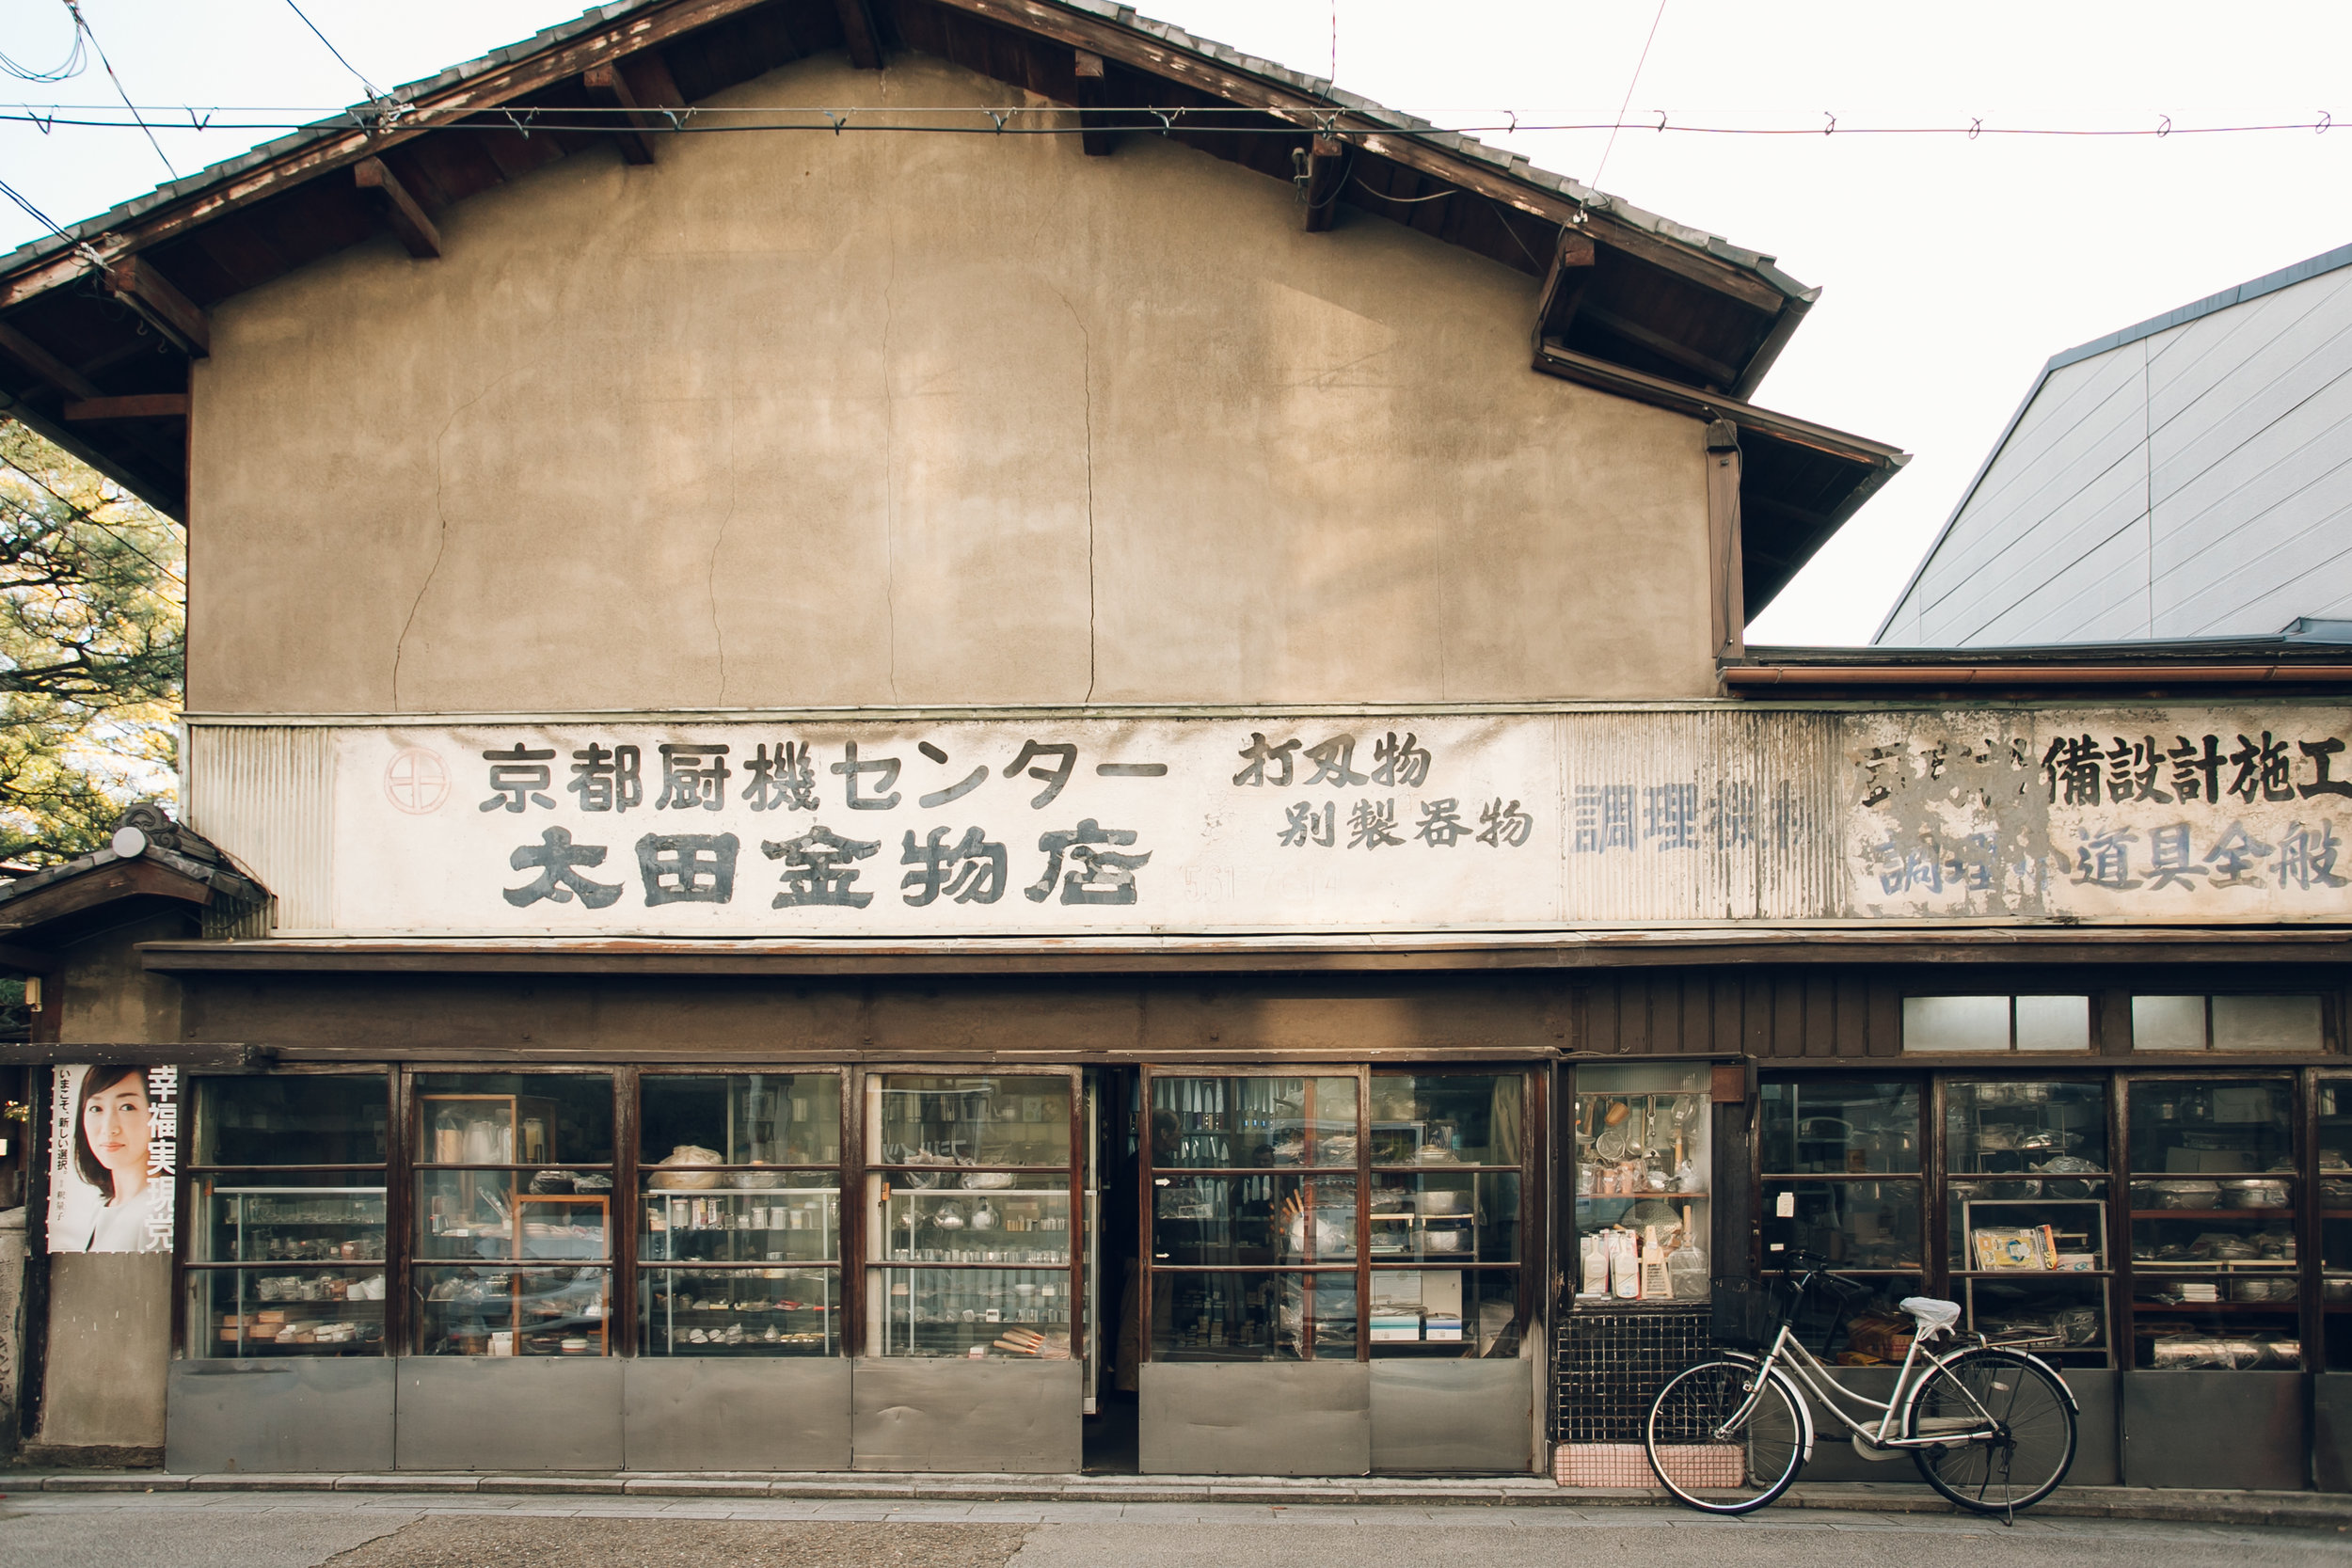 Haarkon in Kyoto, Japan